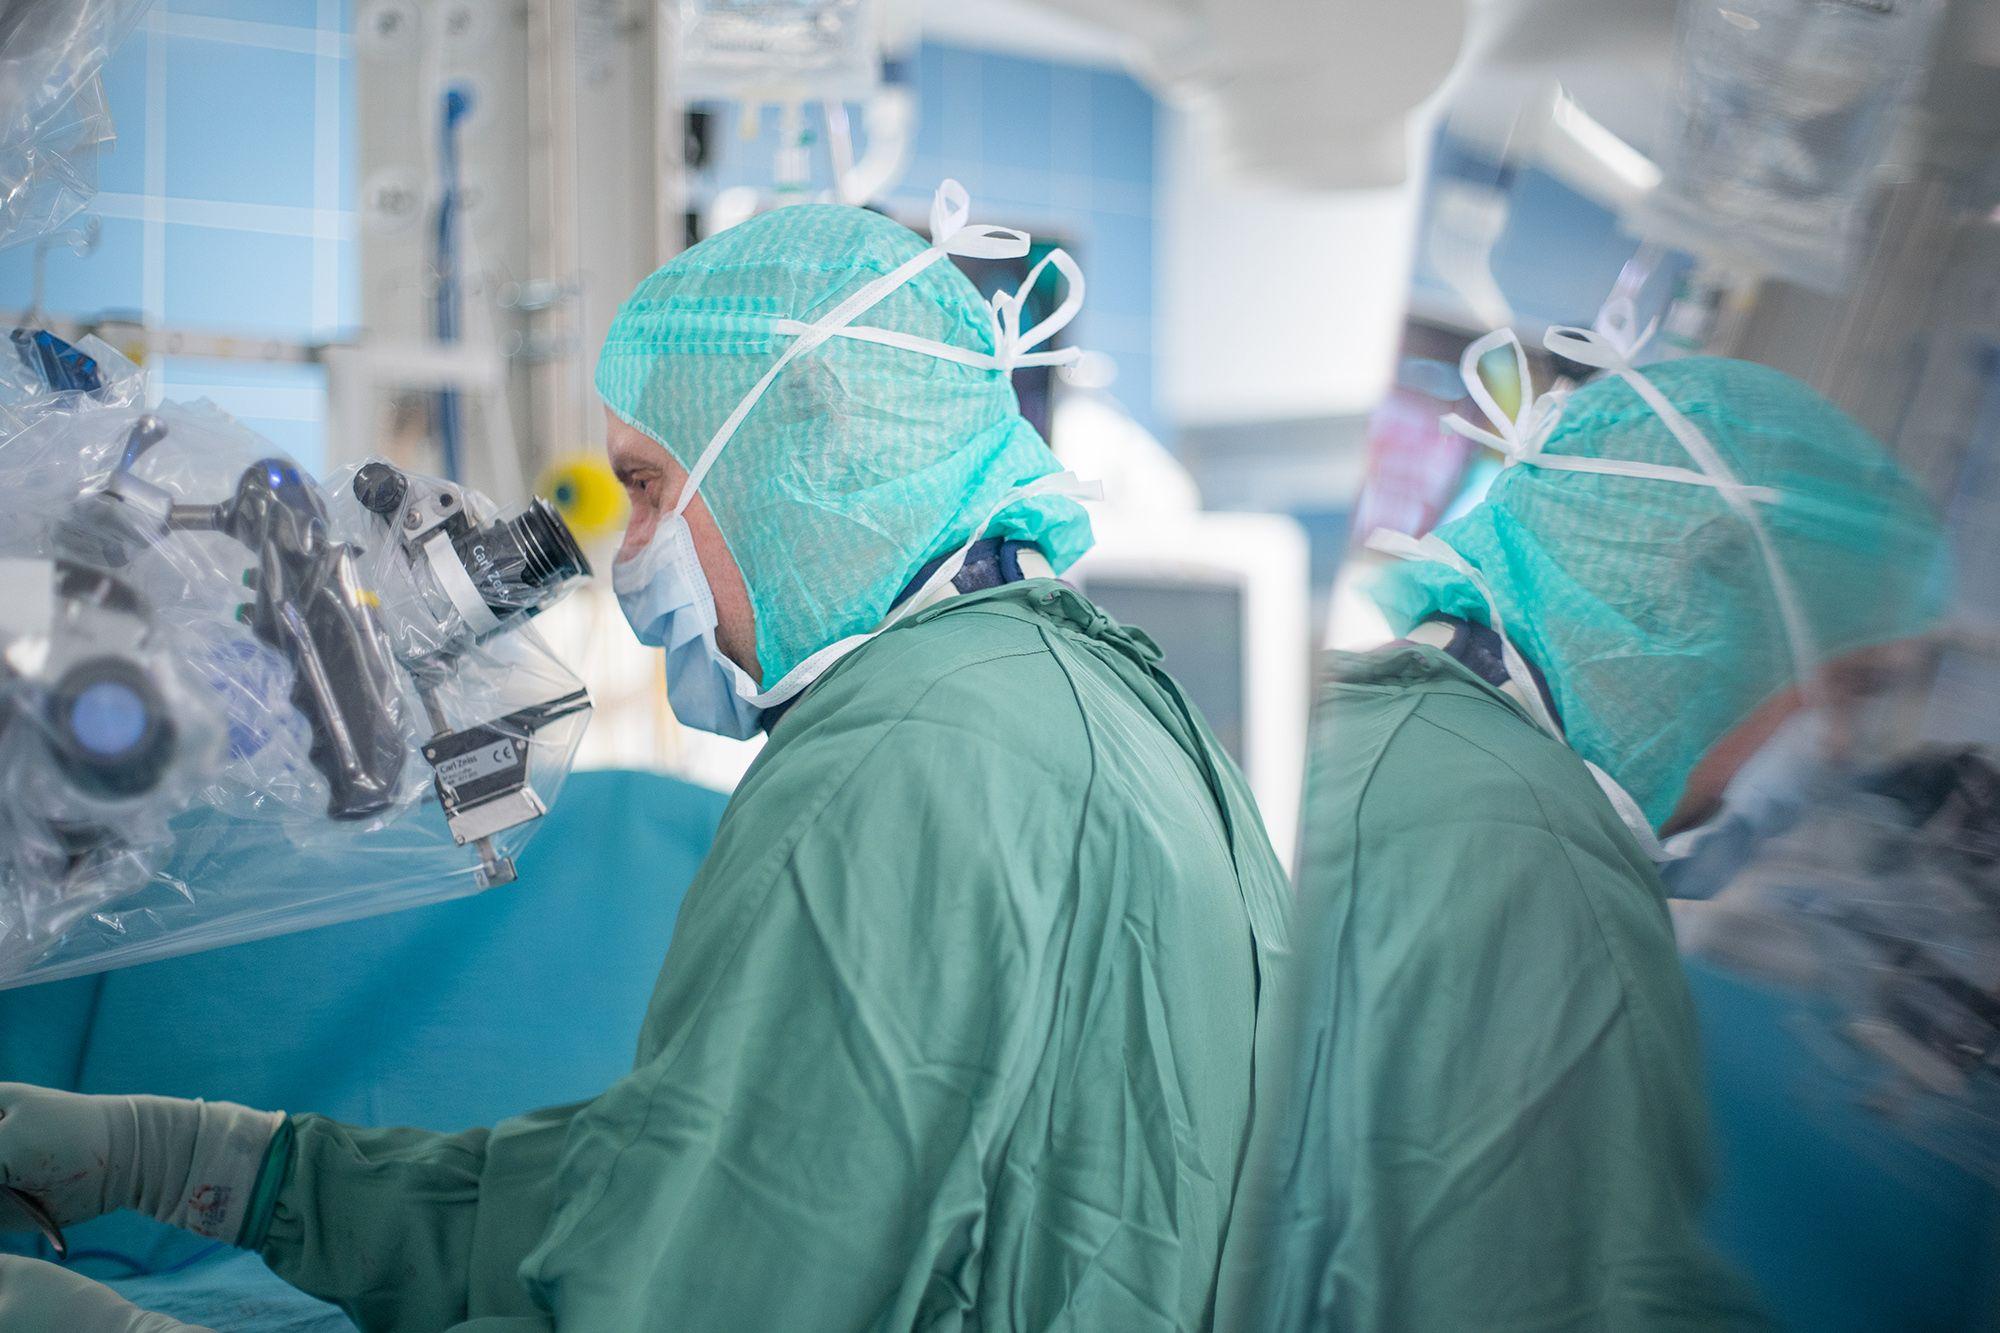 Kys Neurokirurgia